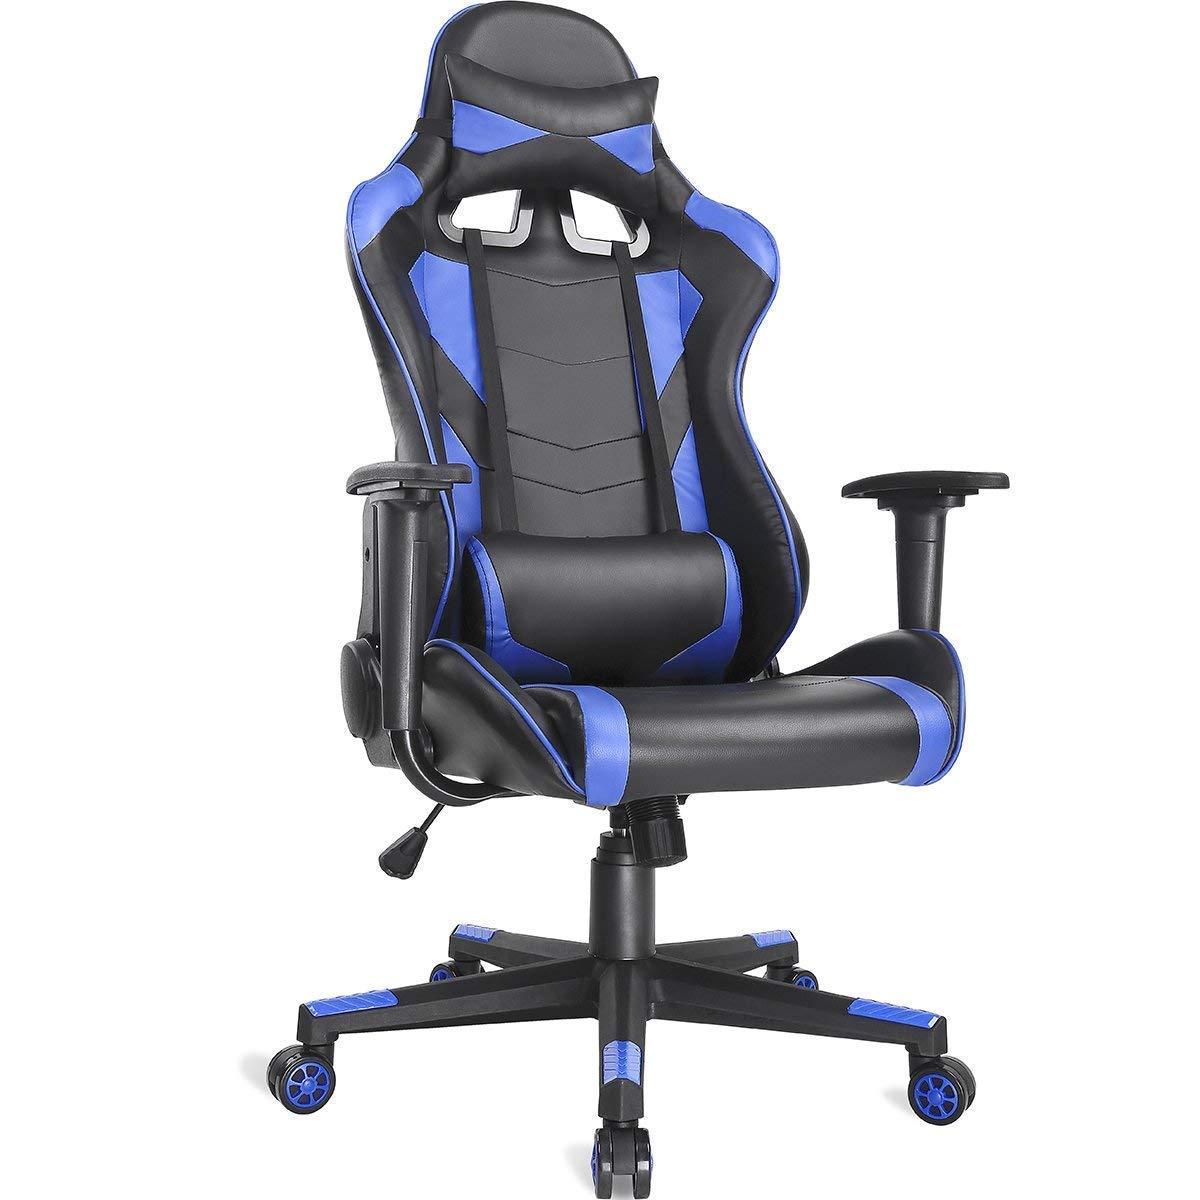 Gaming Chair,Racing Chair, Ergonomic Chair,Swivel Chair. Ulikit